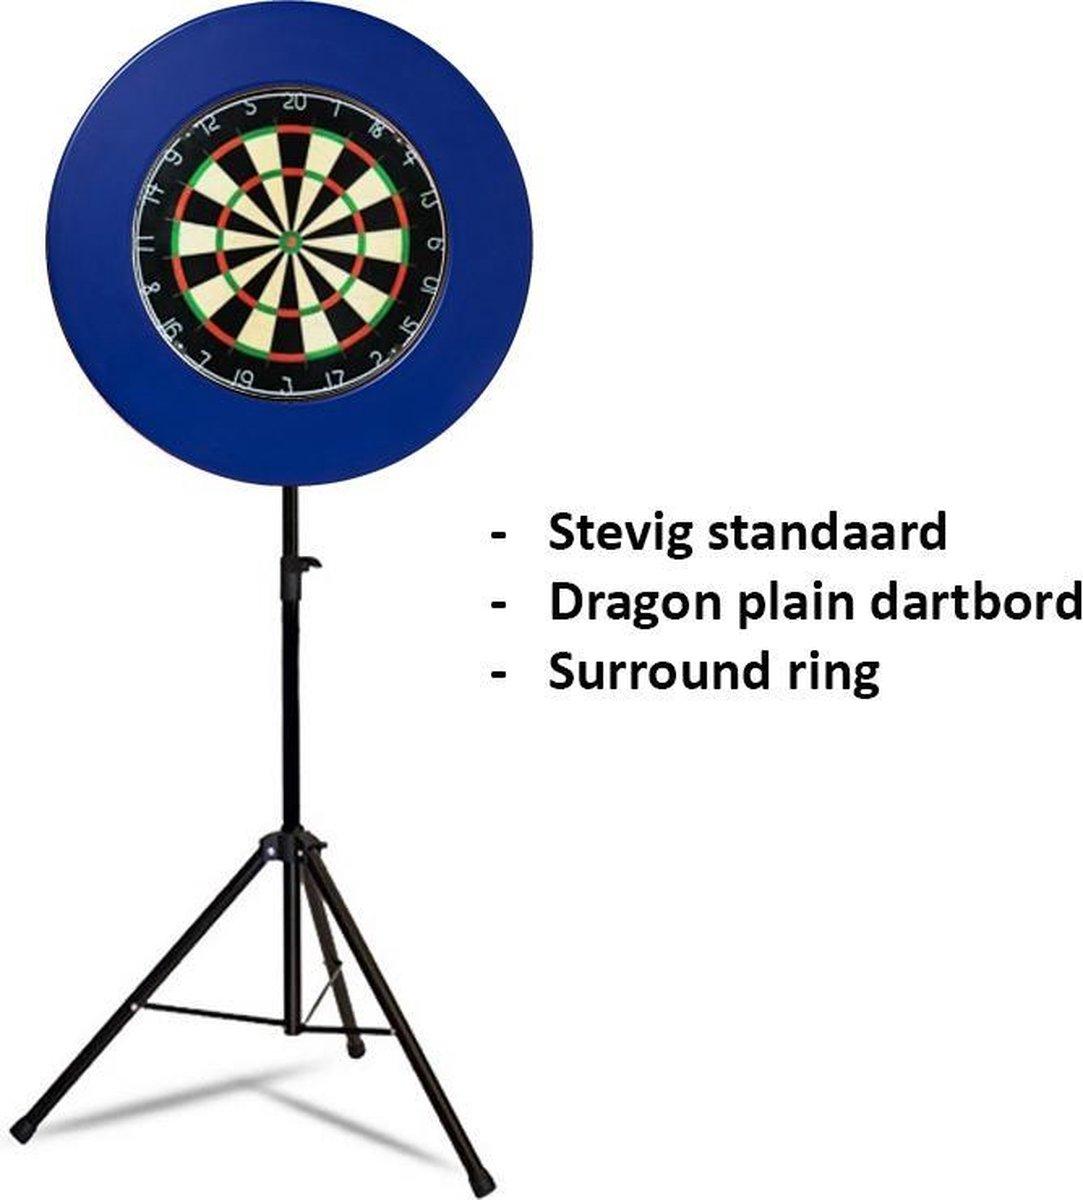 Dragon darts - Portable dartbord standaard pakket - inclusief best geteste - dartbord en - dartbord surround ring - blauw